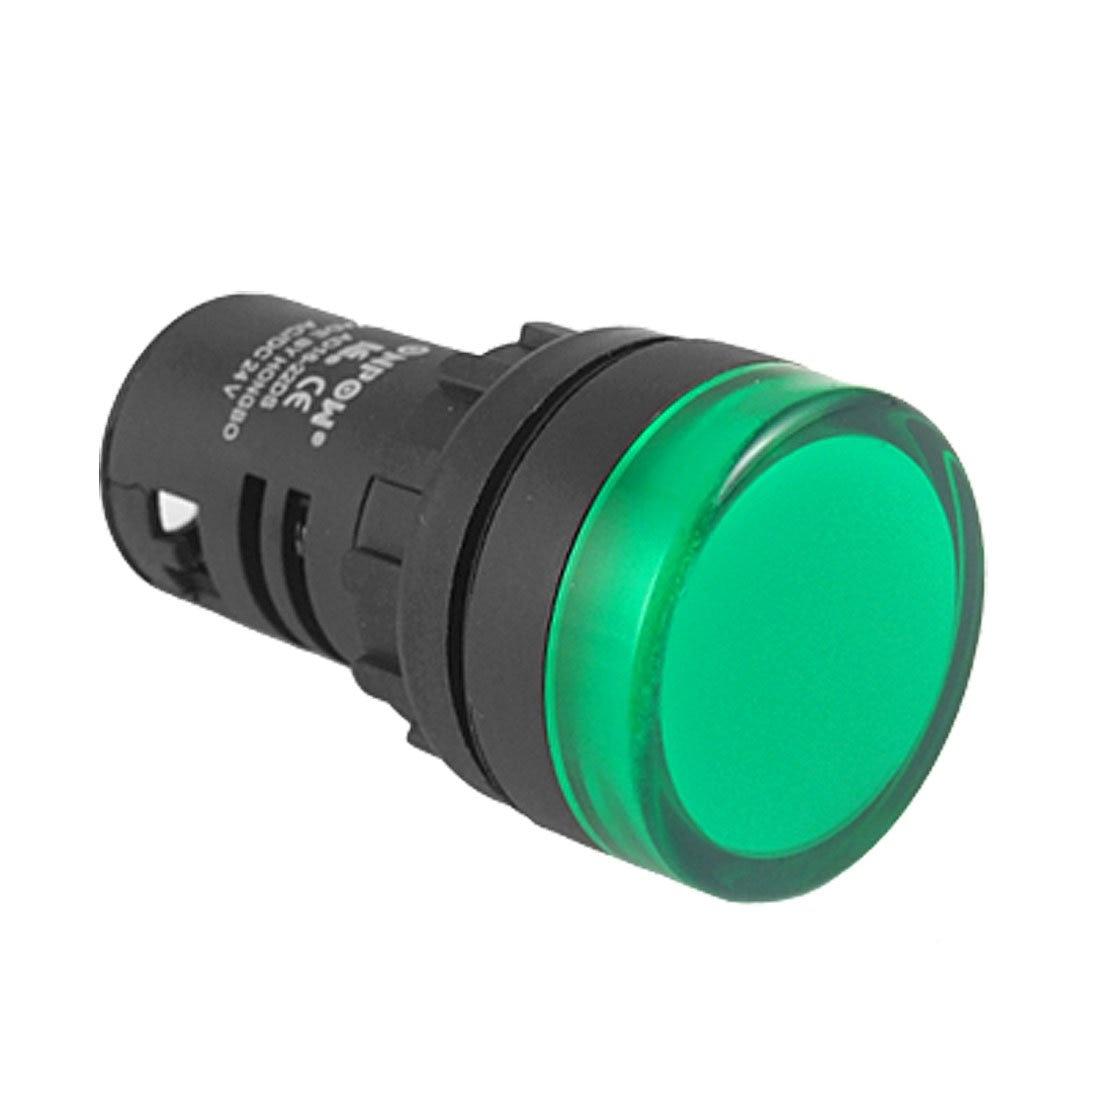 THGS Panel Mount Green Pilot Light Signal Indicator Lamp AC DC 24V ...